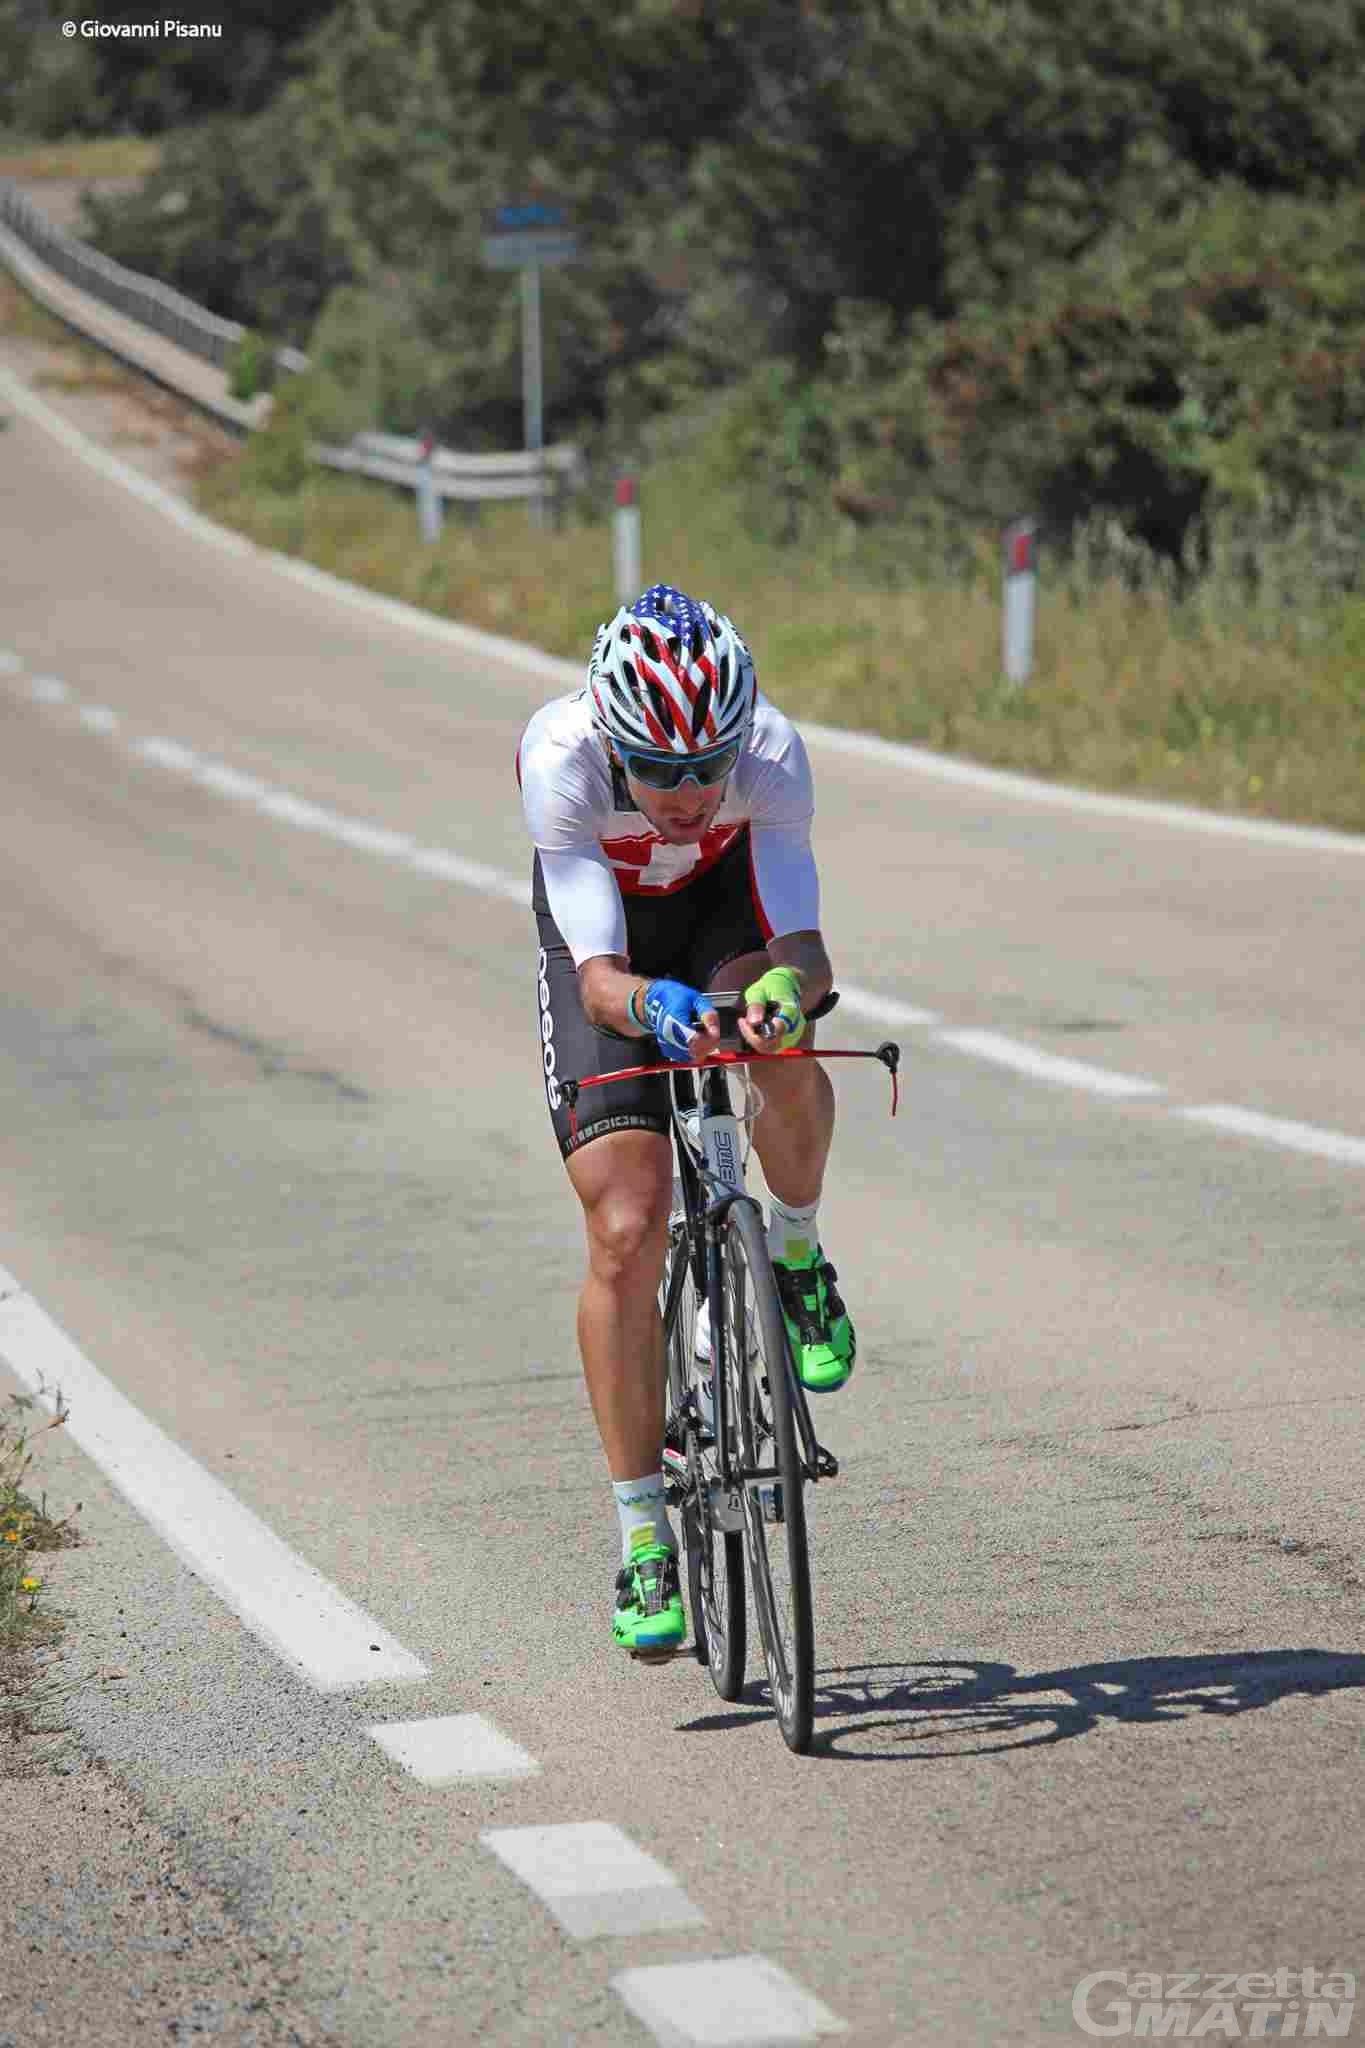 Ciclismo: Leonardo Mona vince la GF Tre Valli Varesine